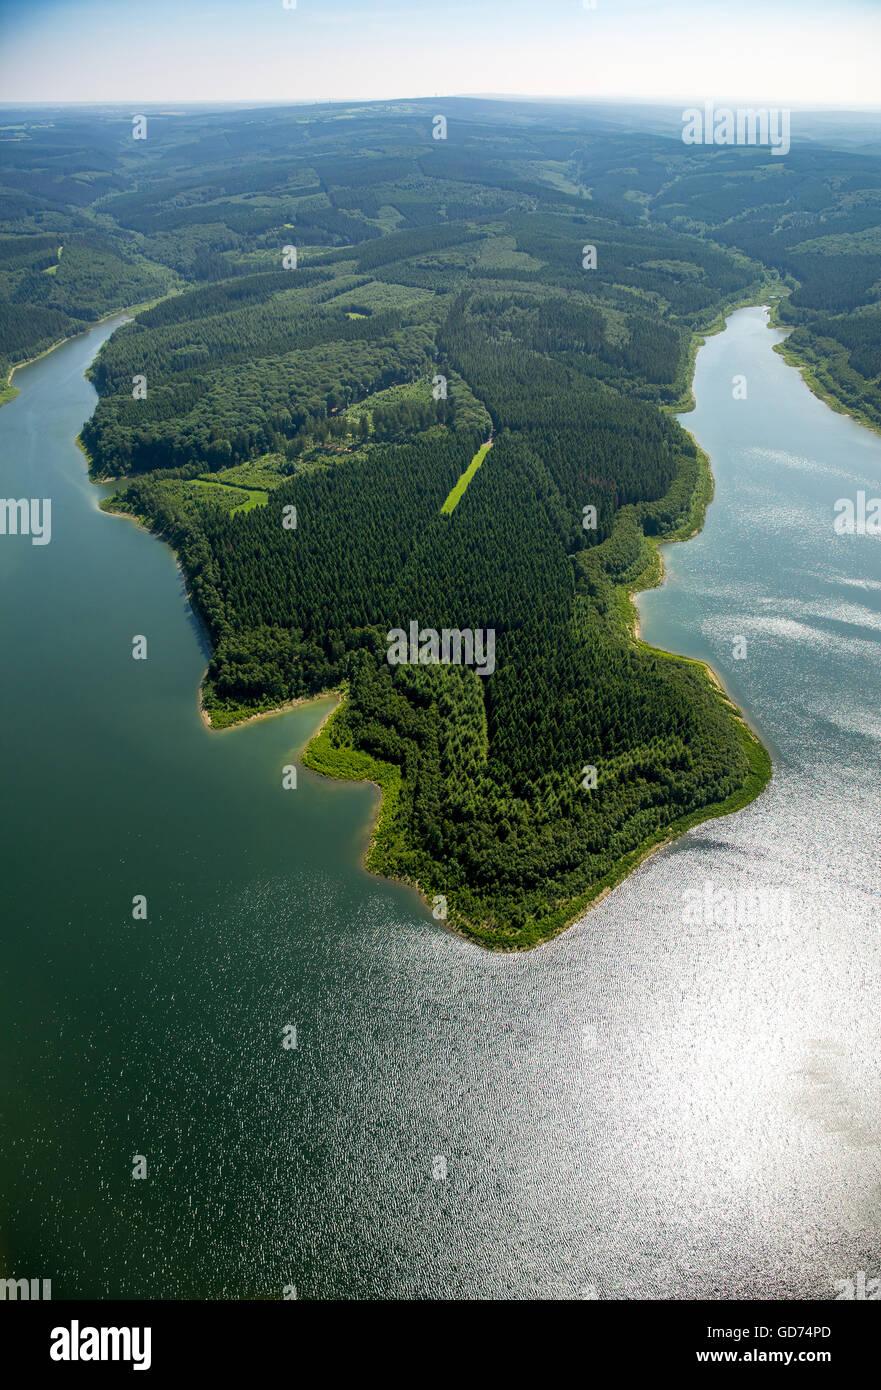 Aerial view, Wehebach dam with water reflections, Hürtgenwald, Rhineland, North Rhine Westphalia, Germany, - Stock Image